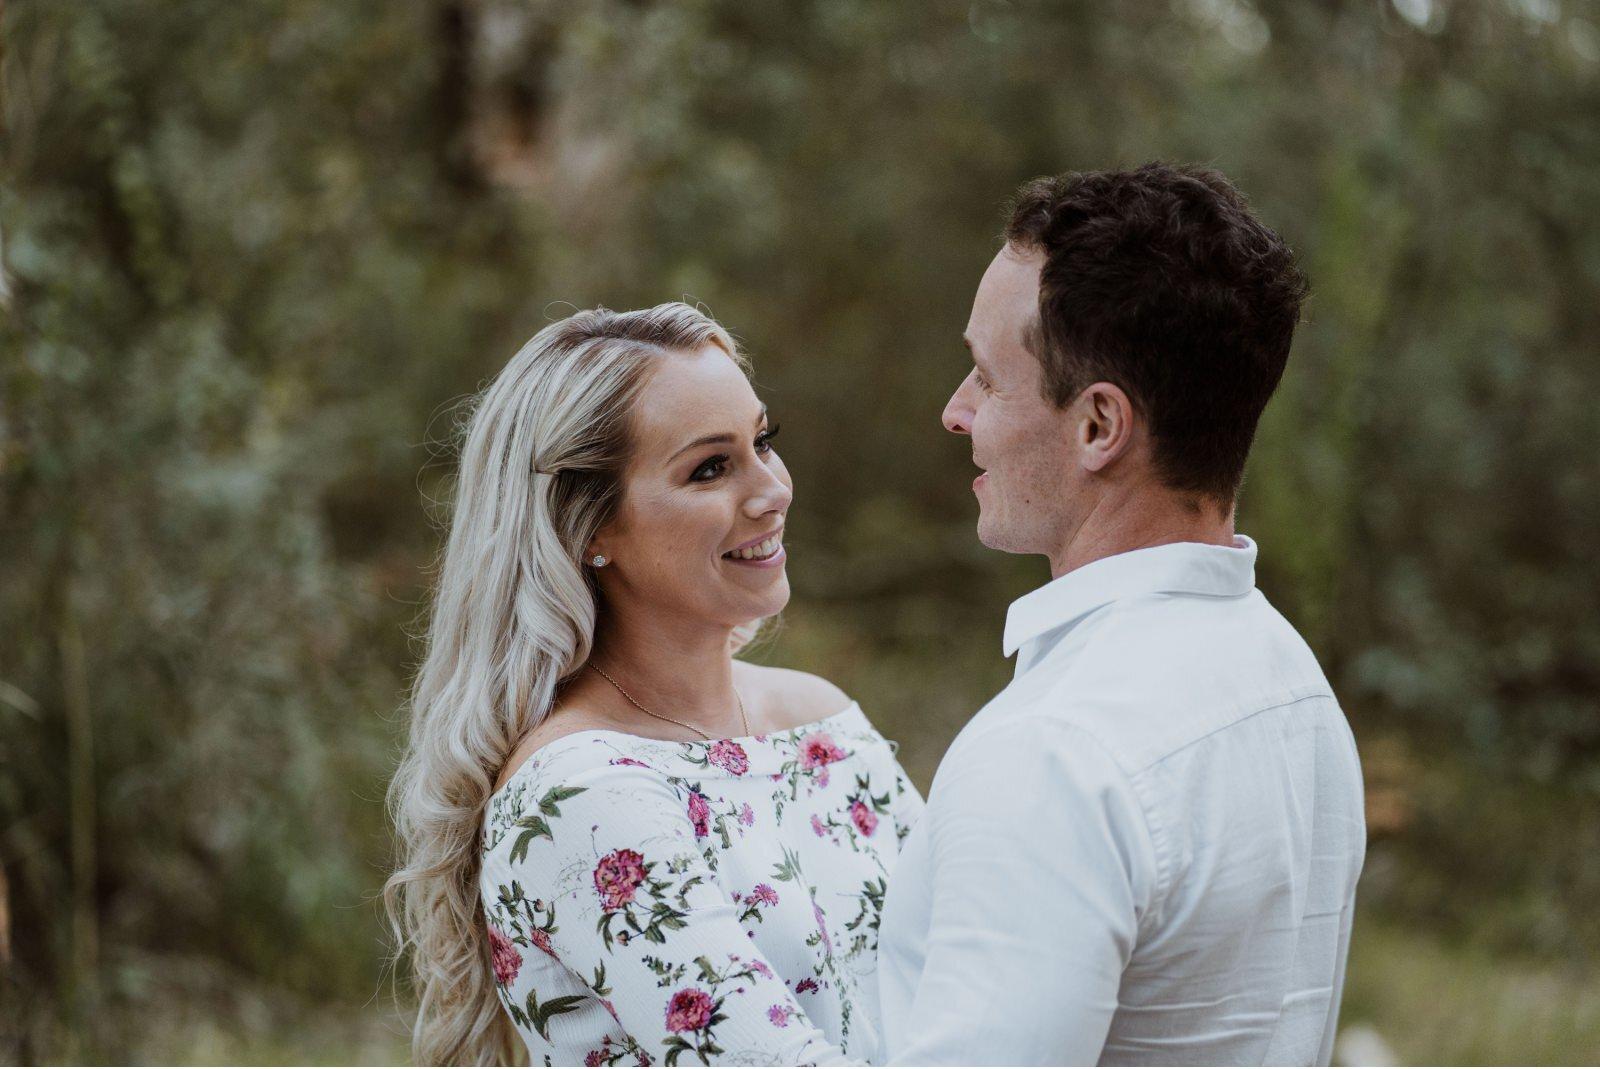 newcastle-wedding-photographer-dudley-engagement-shoot-10.jpg